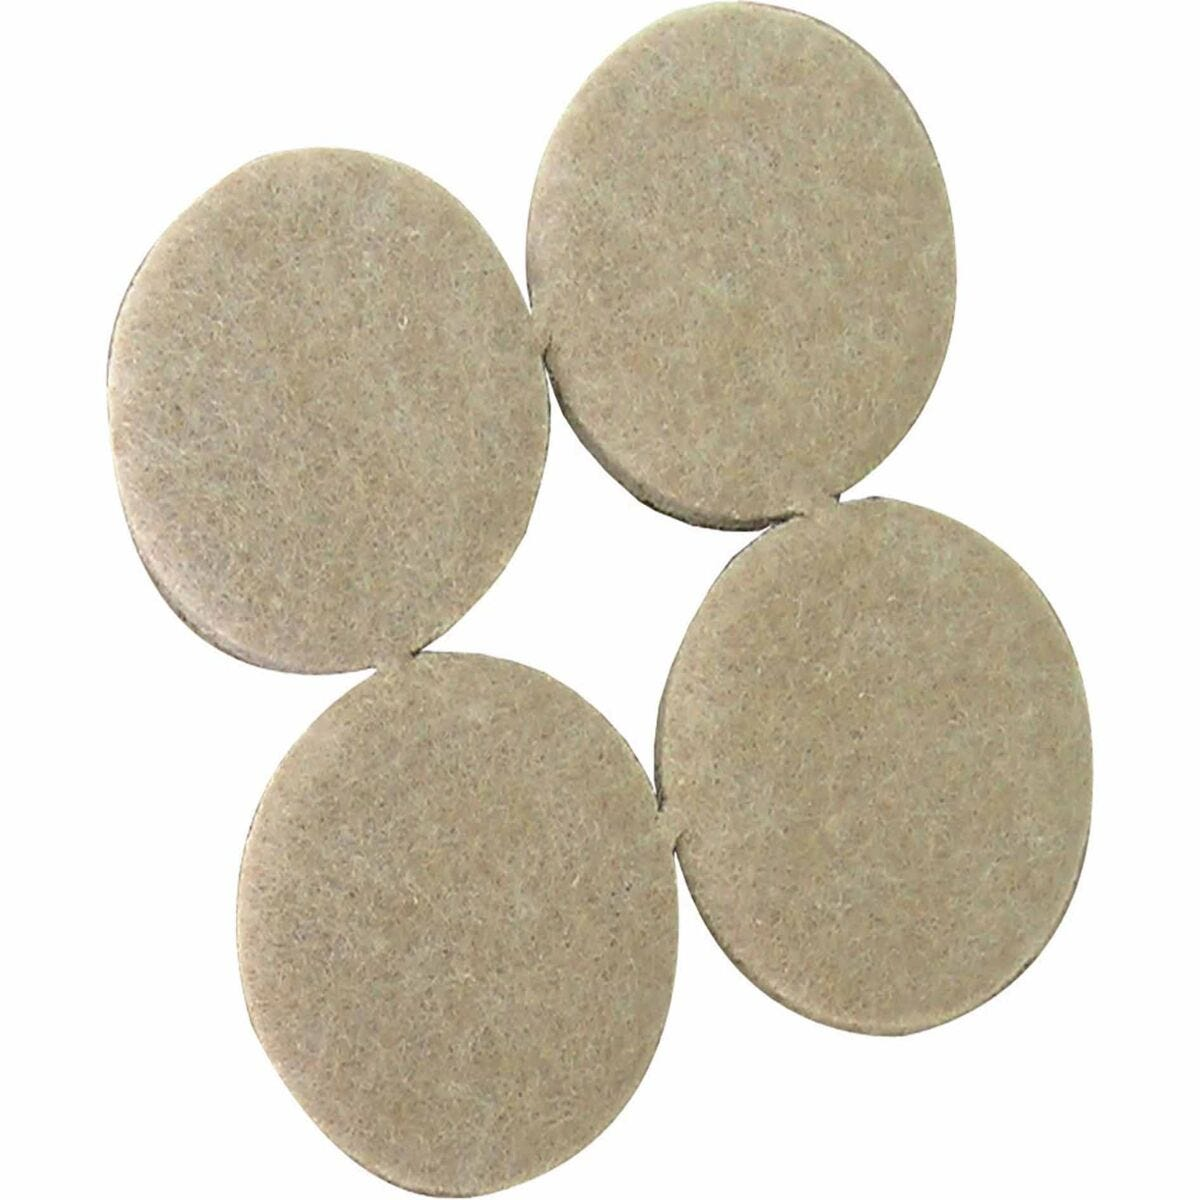 Floor Felt Protection Pads Medium Pack of 8